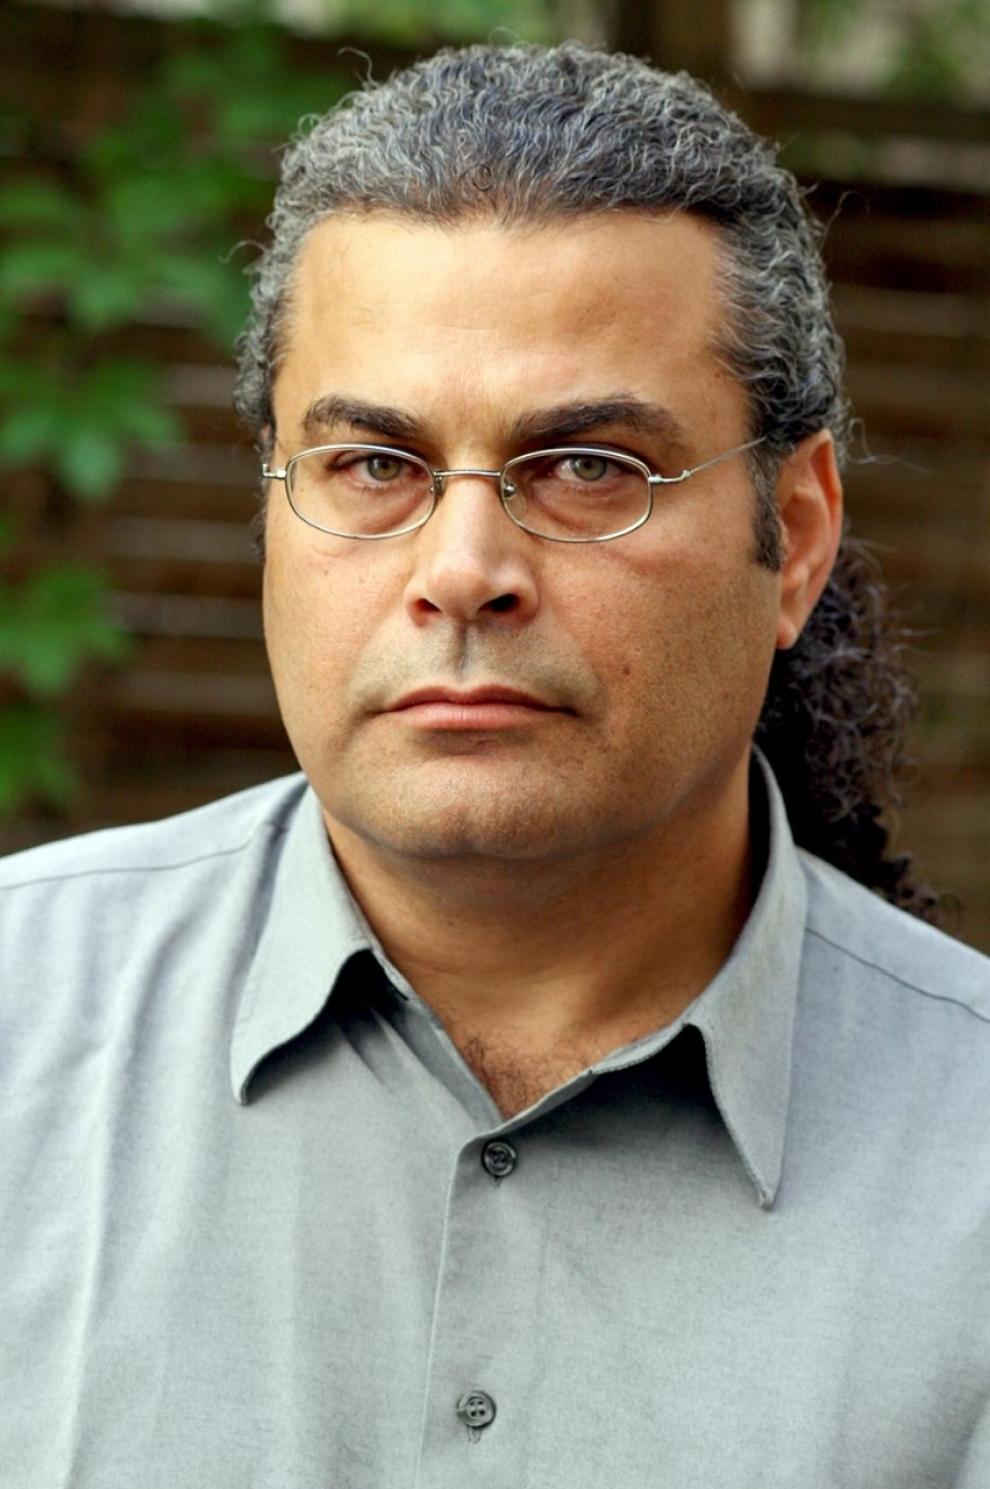 Khaled El Masri